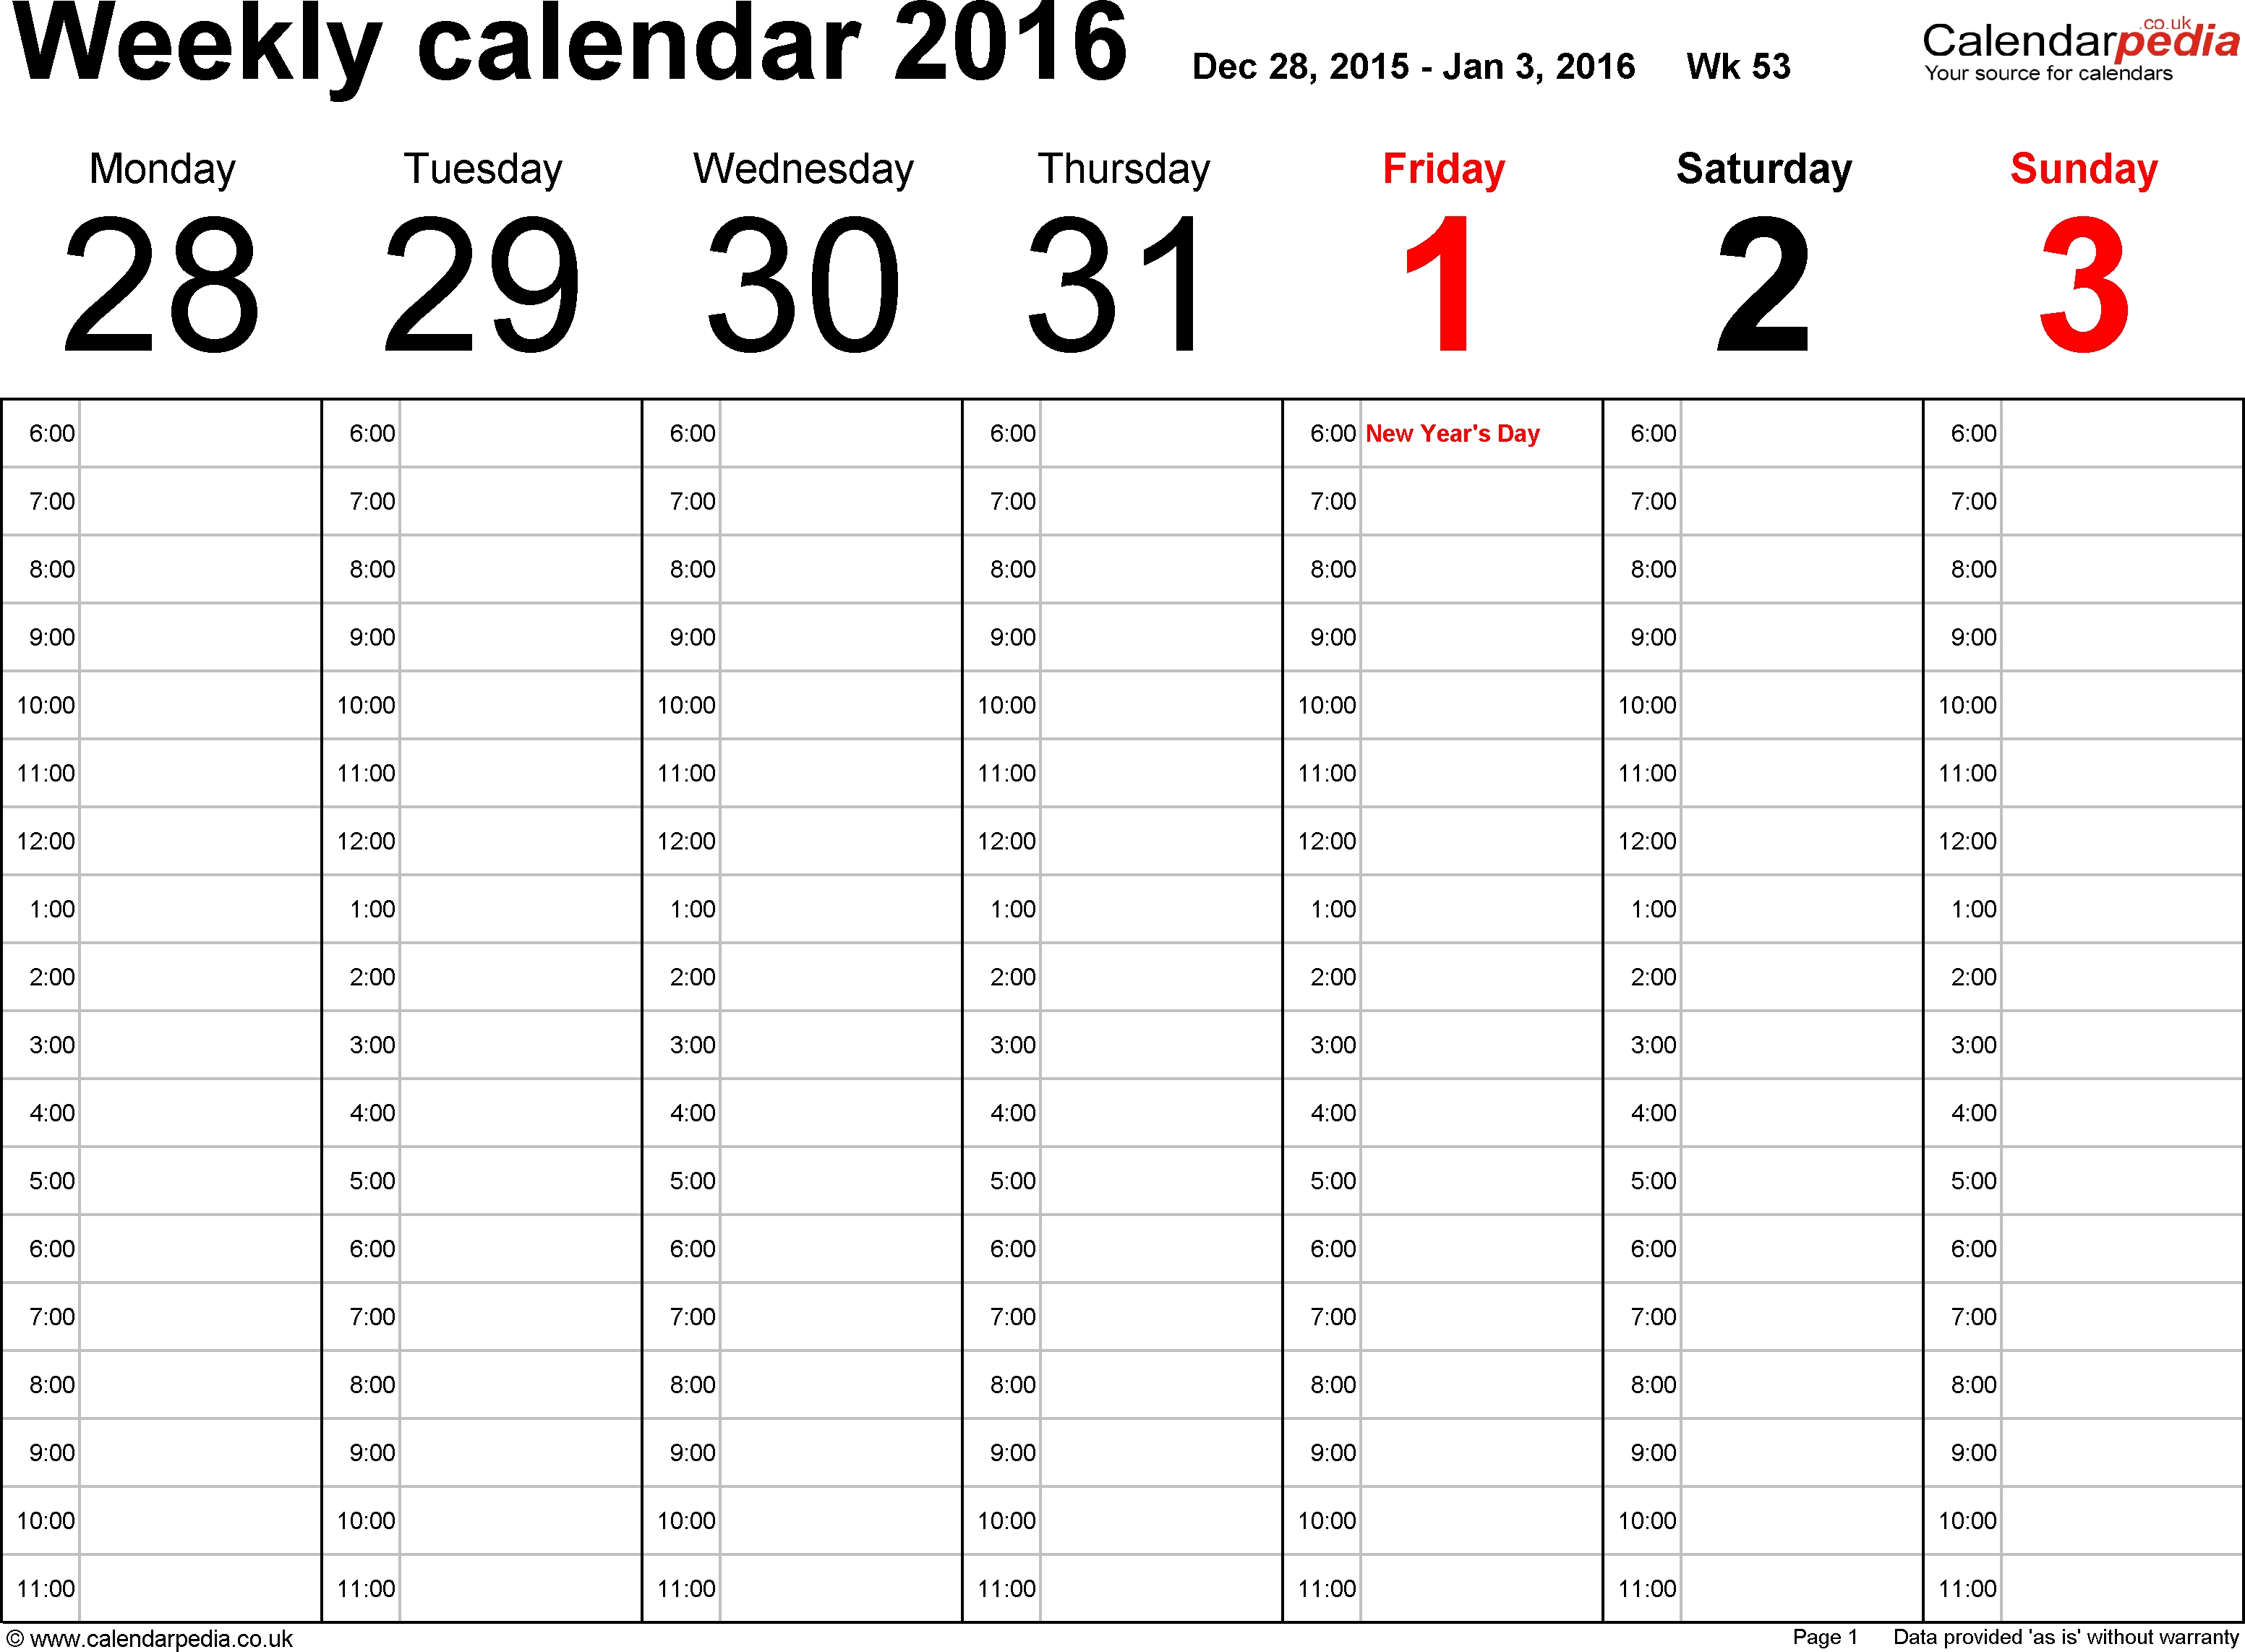 5 Weekly Calendar Templates - Excel Pdf Formats regarding Emplyee Schedule Template Starting Friday